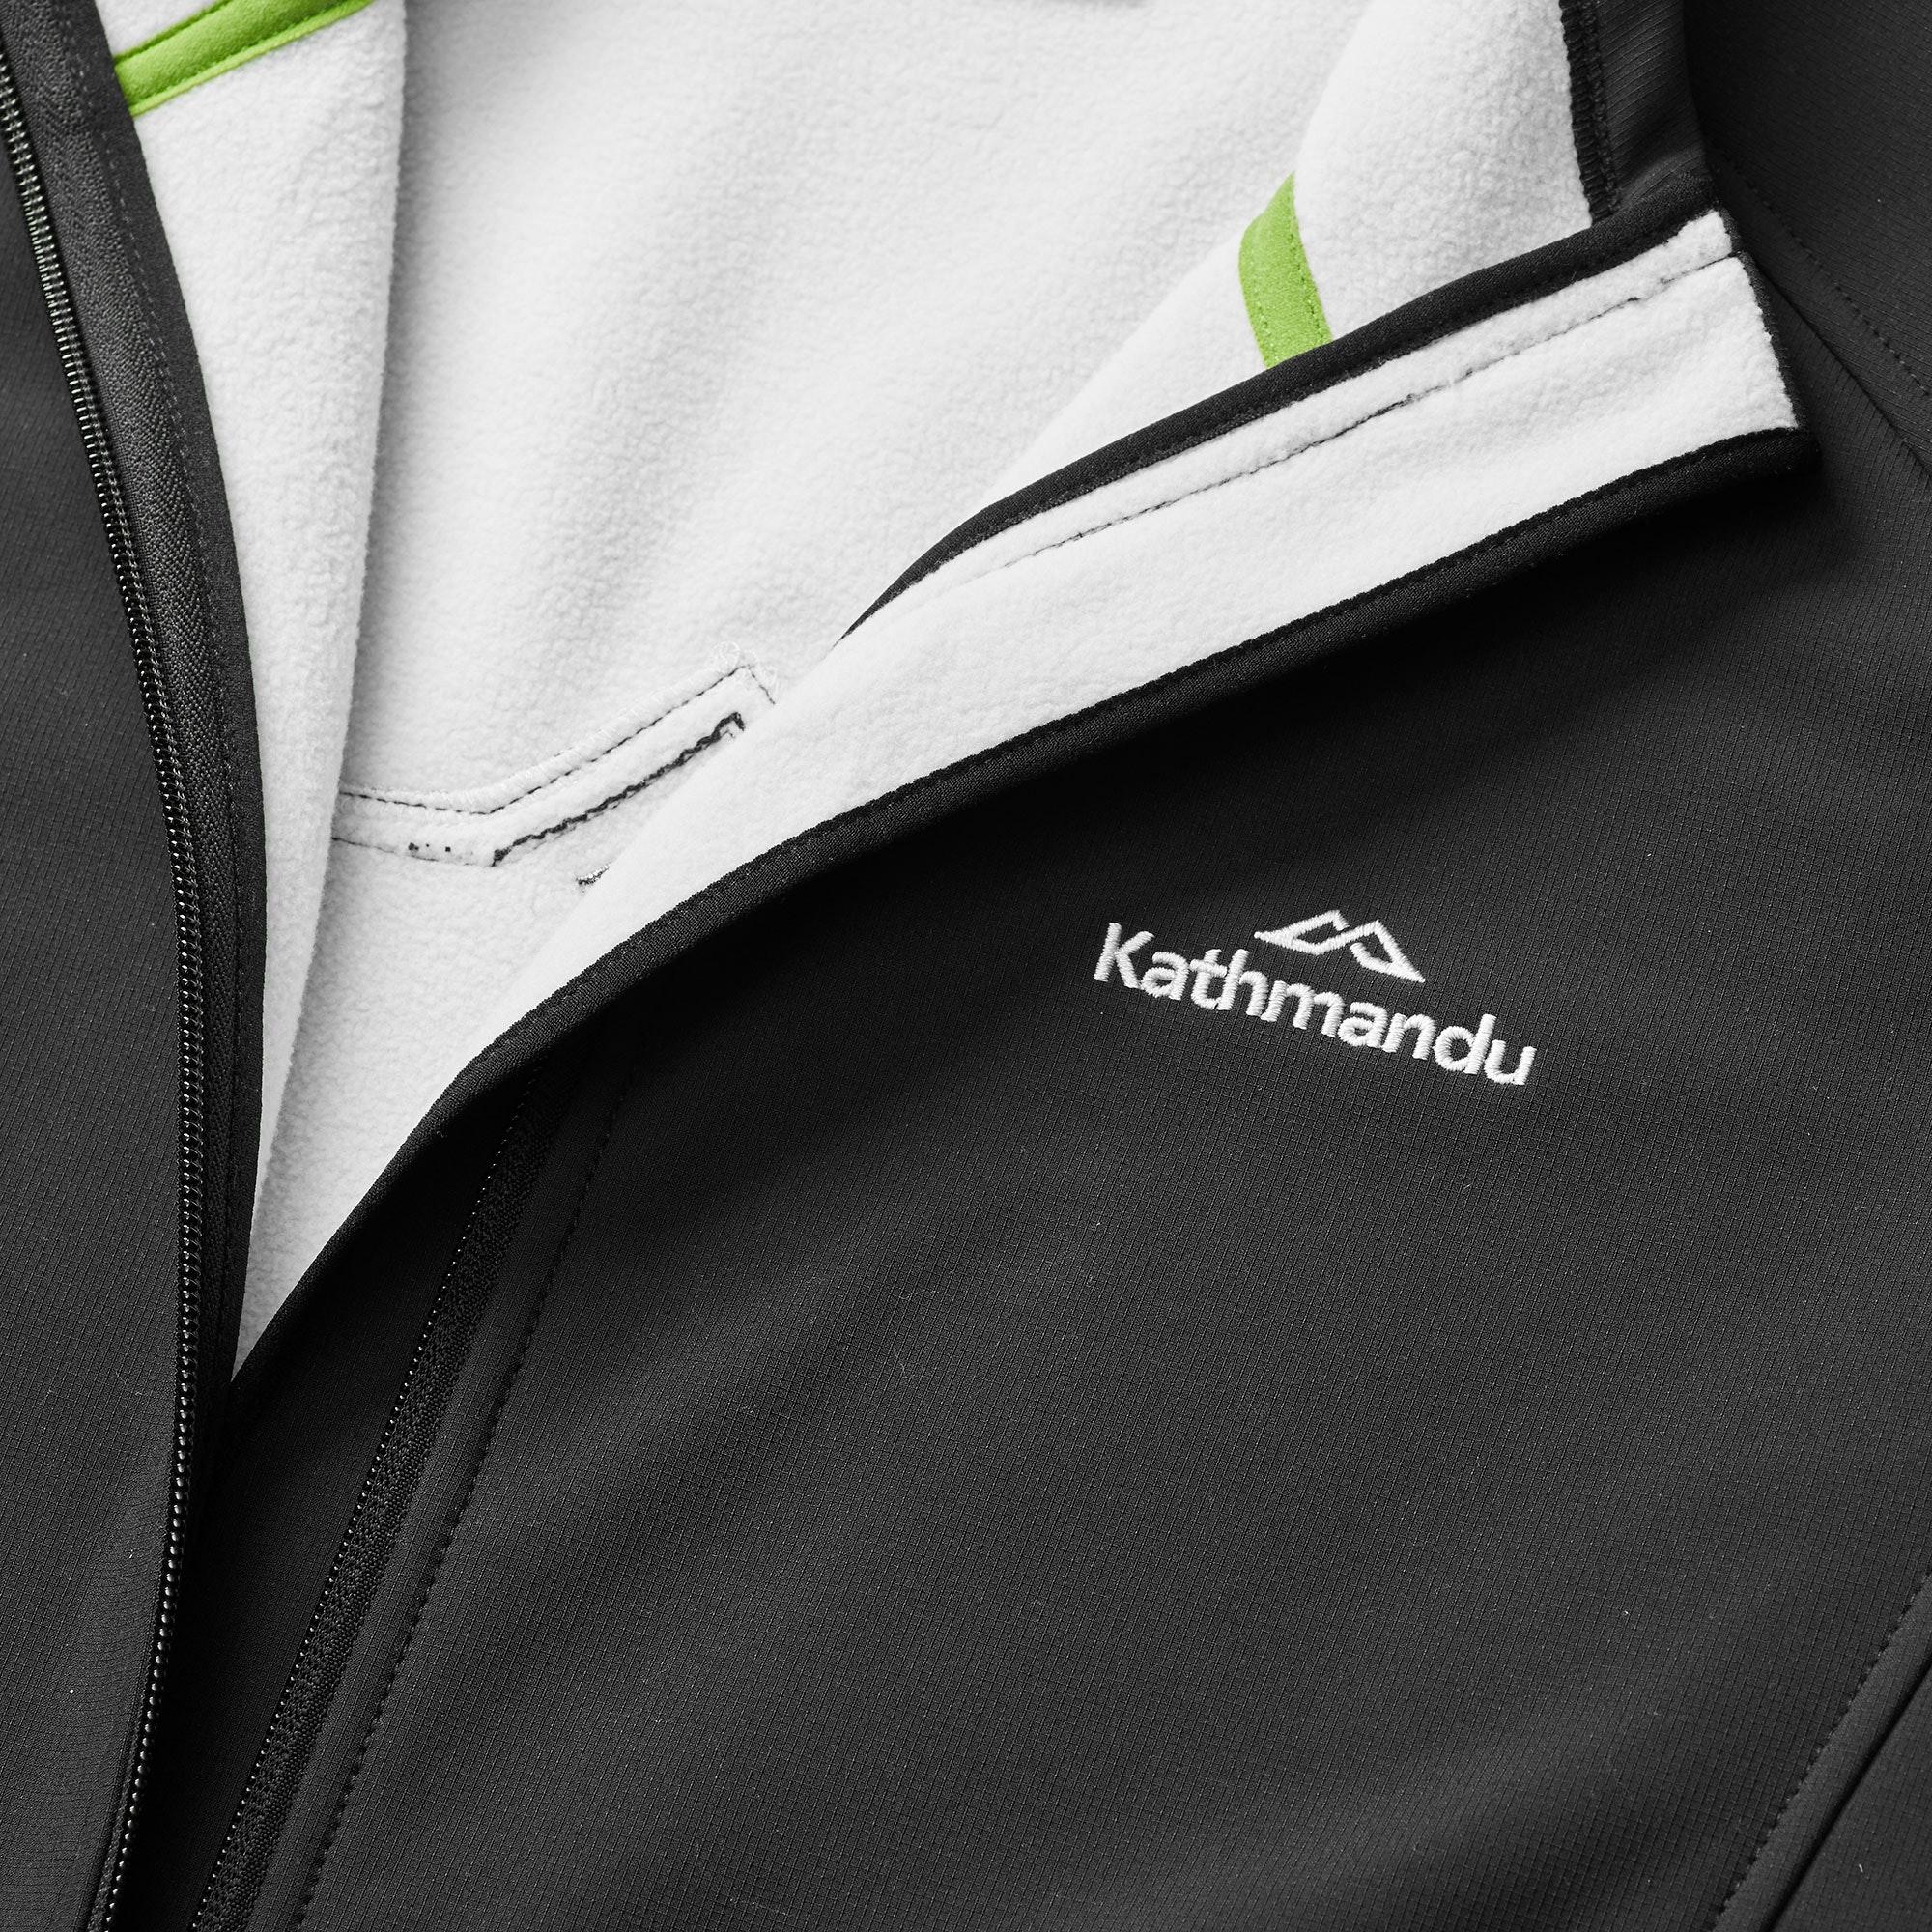 Kathmandu-Arbury-Wind-Resistant-Water-Repellent-Breathable-Outdoor-Men-039-s-Jacket